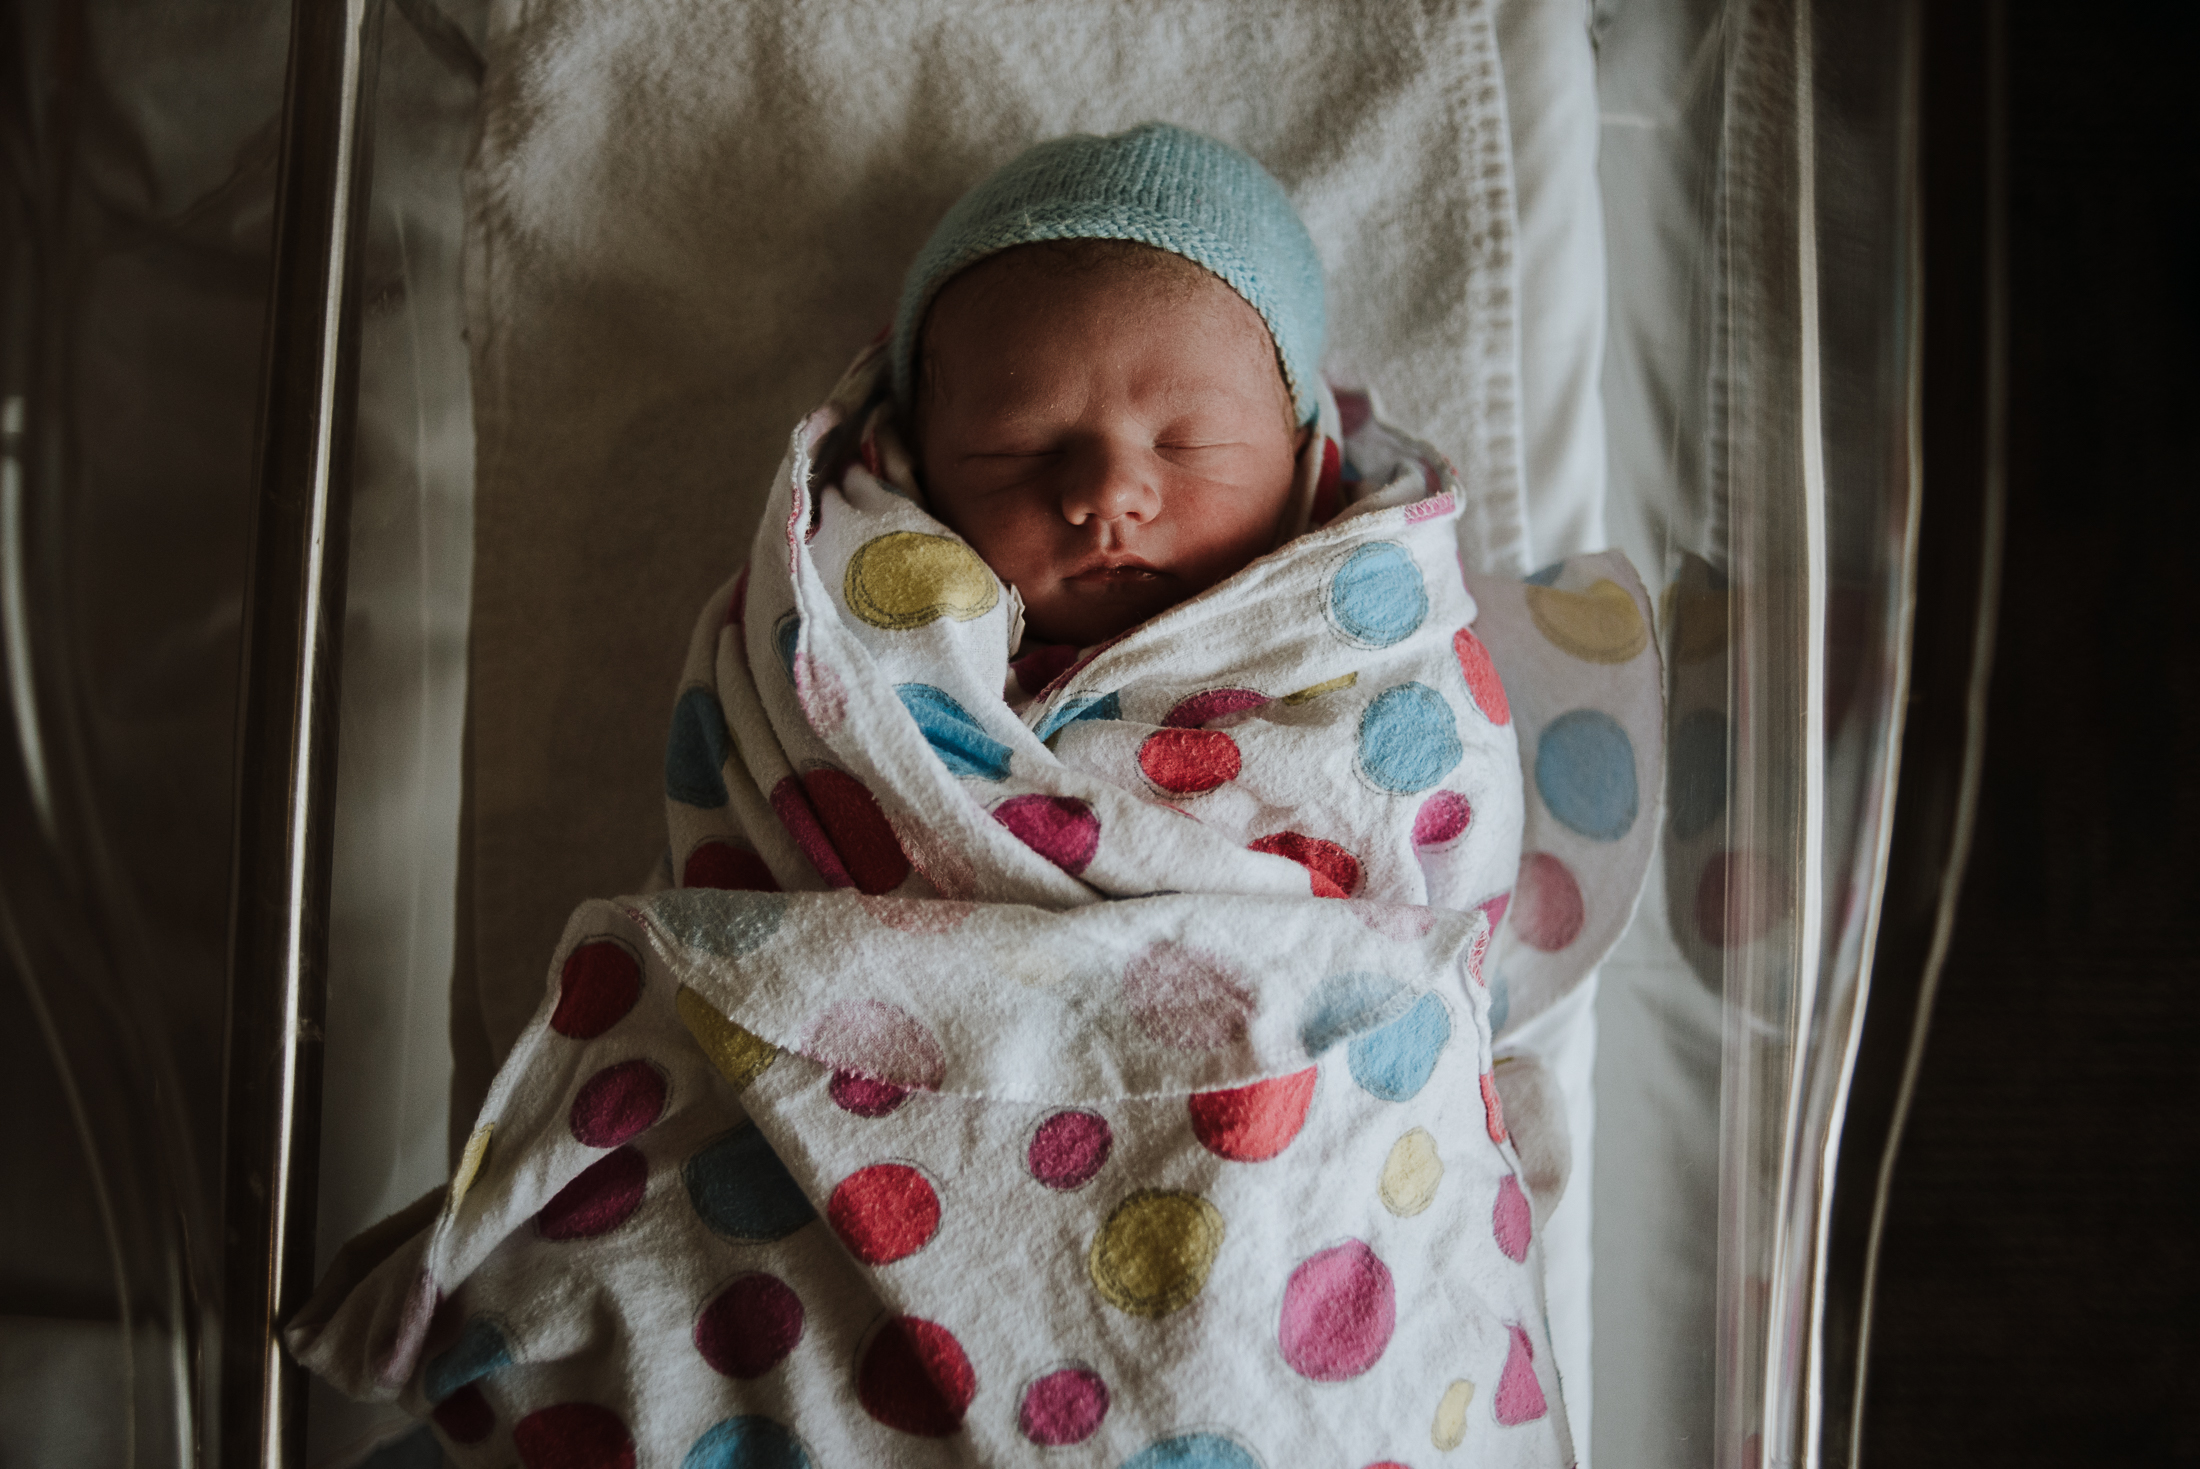 jessica-howard-photograpy-baby-leahy-1.jpg